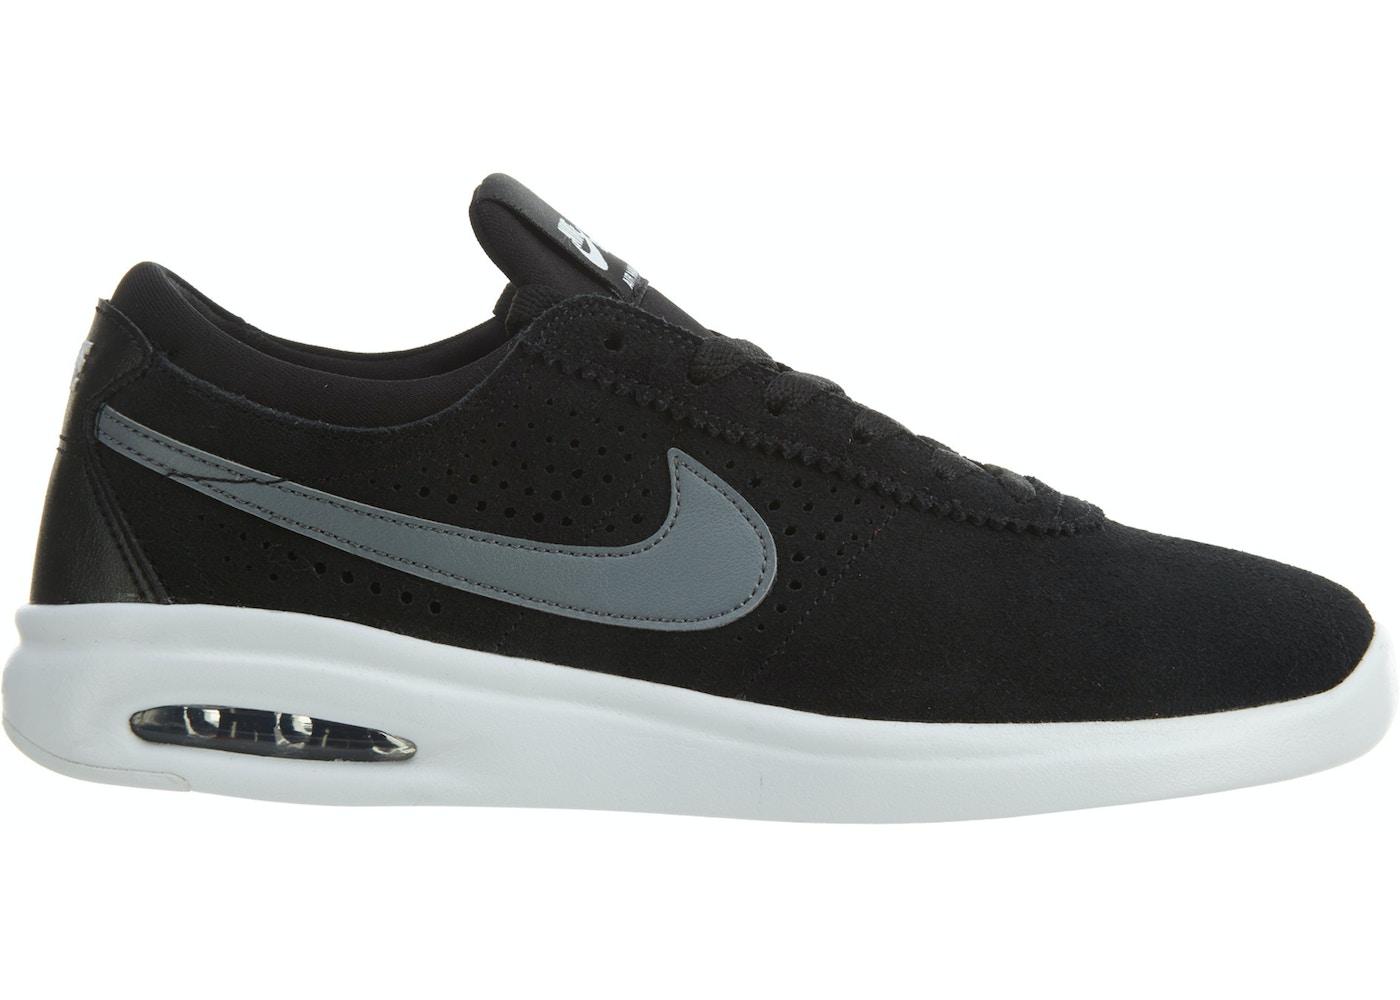 despreciar limpiar Tienda  Nike Sb Bruin Max Vapor Black/Cool Grey-White-White - 882097-001